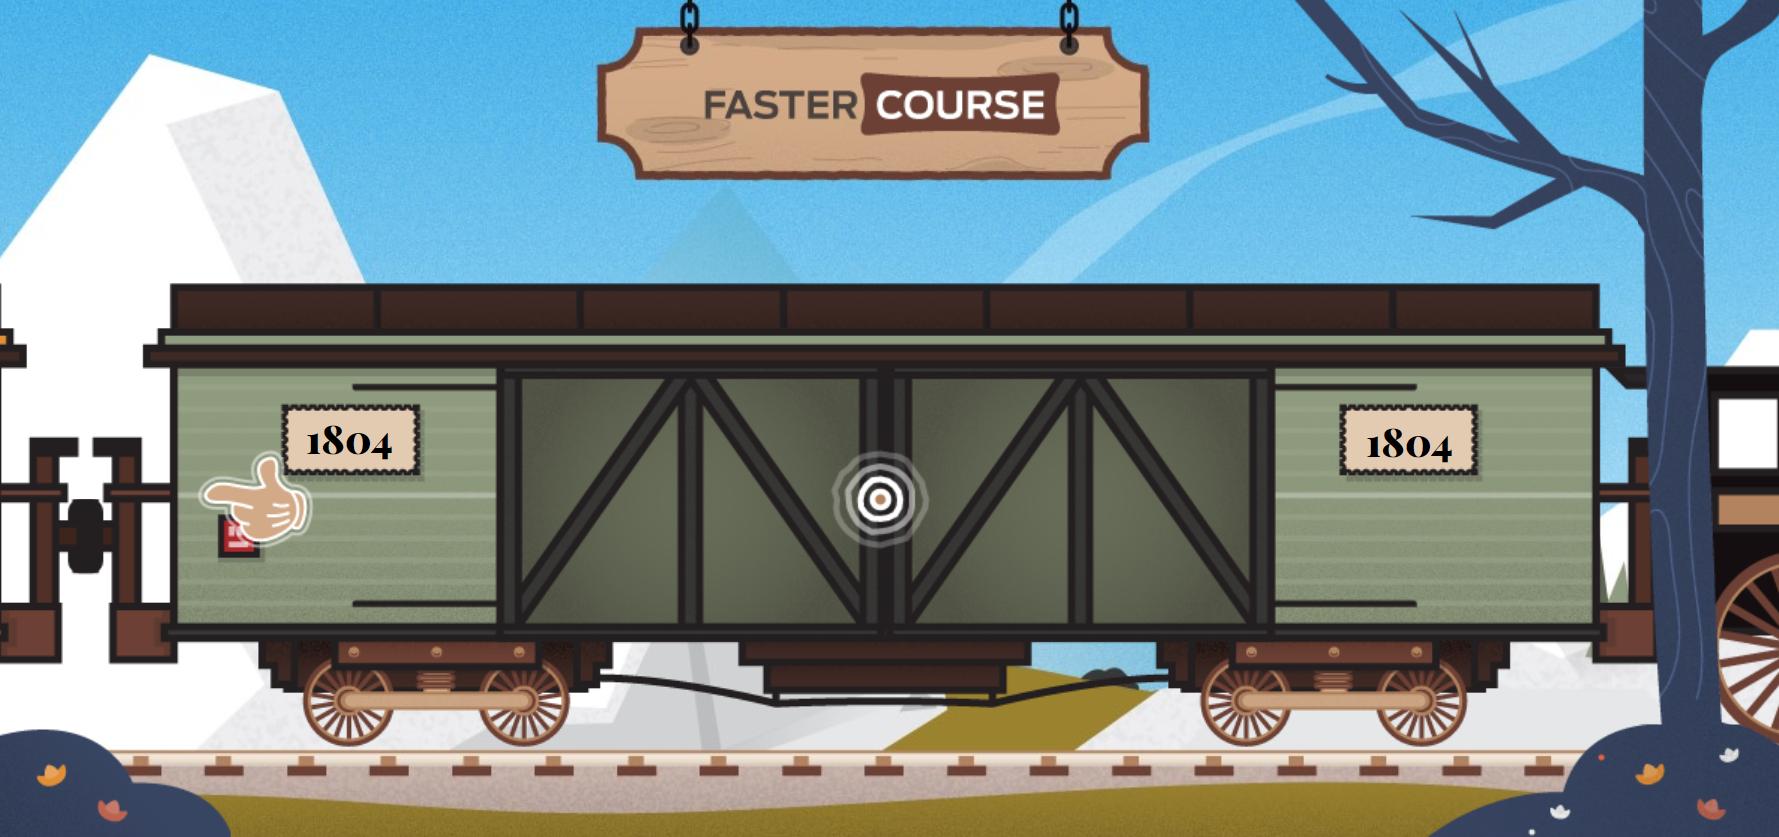 train_timeline_wagon